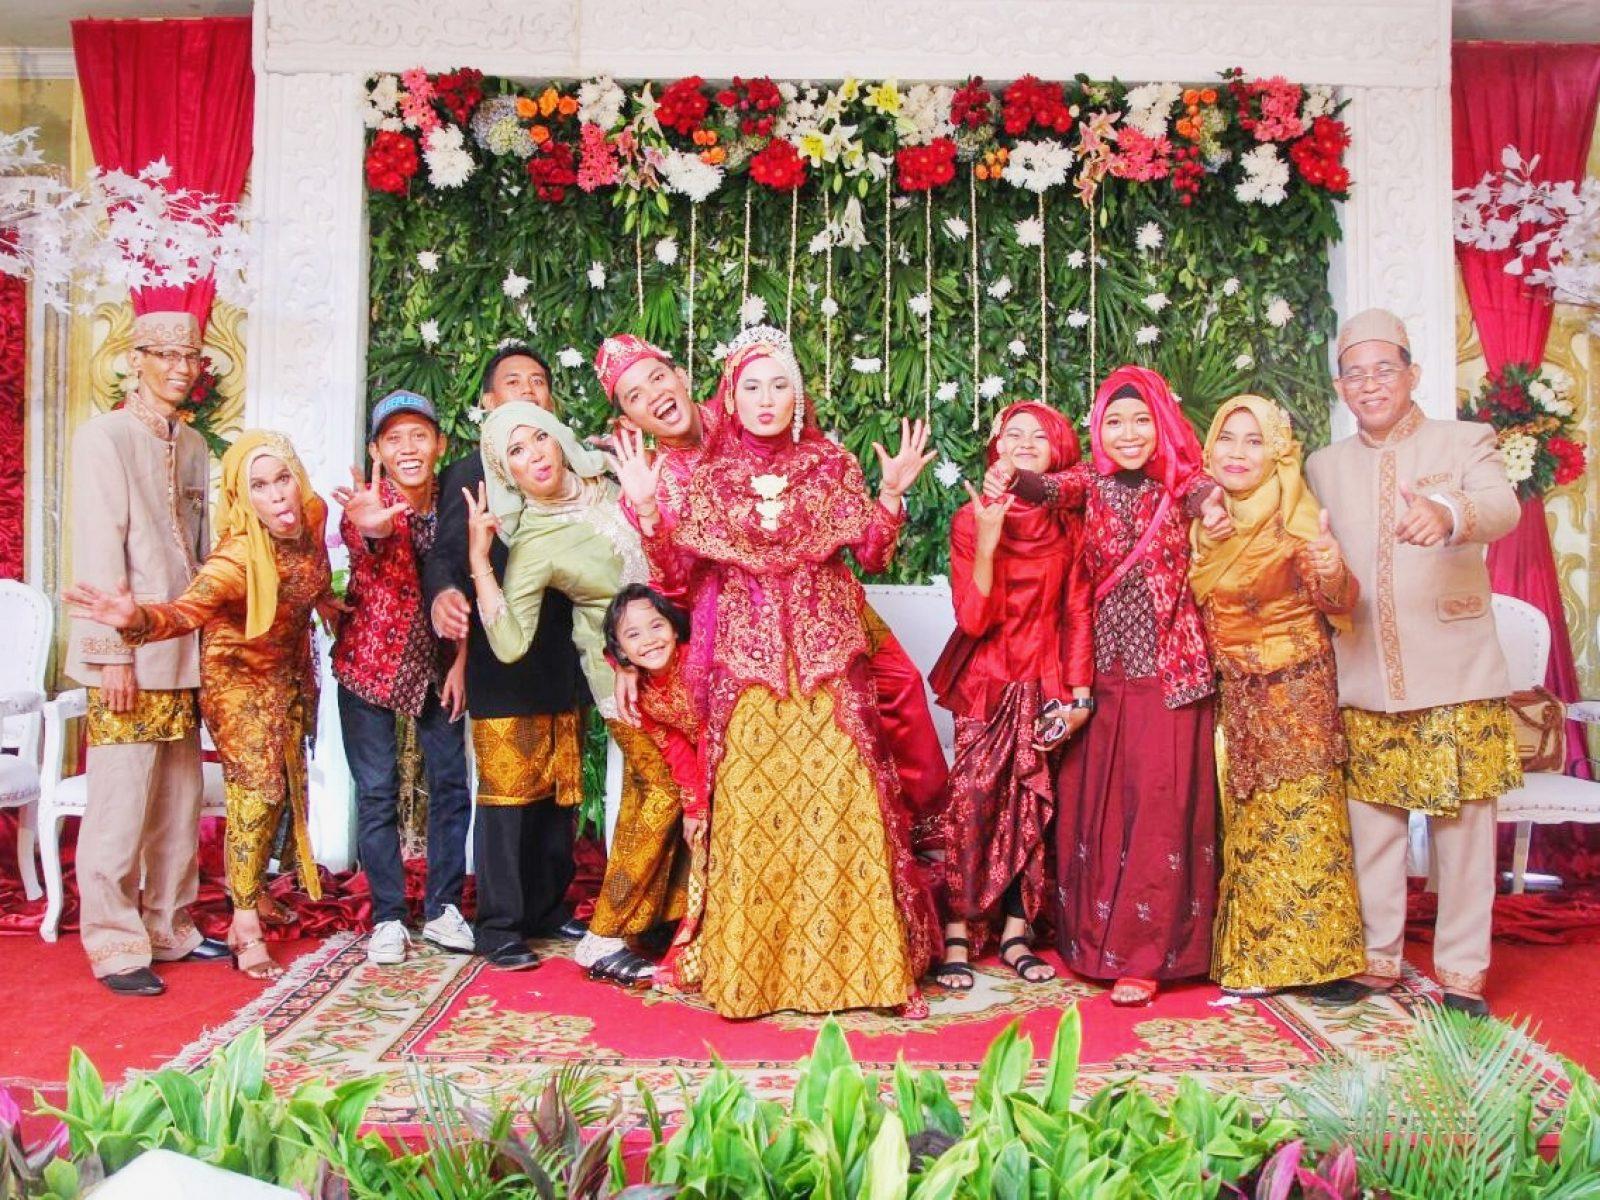 Paket pernikahan yang memudahkan dan membahagiakan pengantin